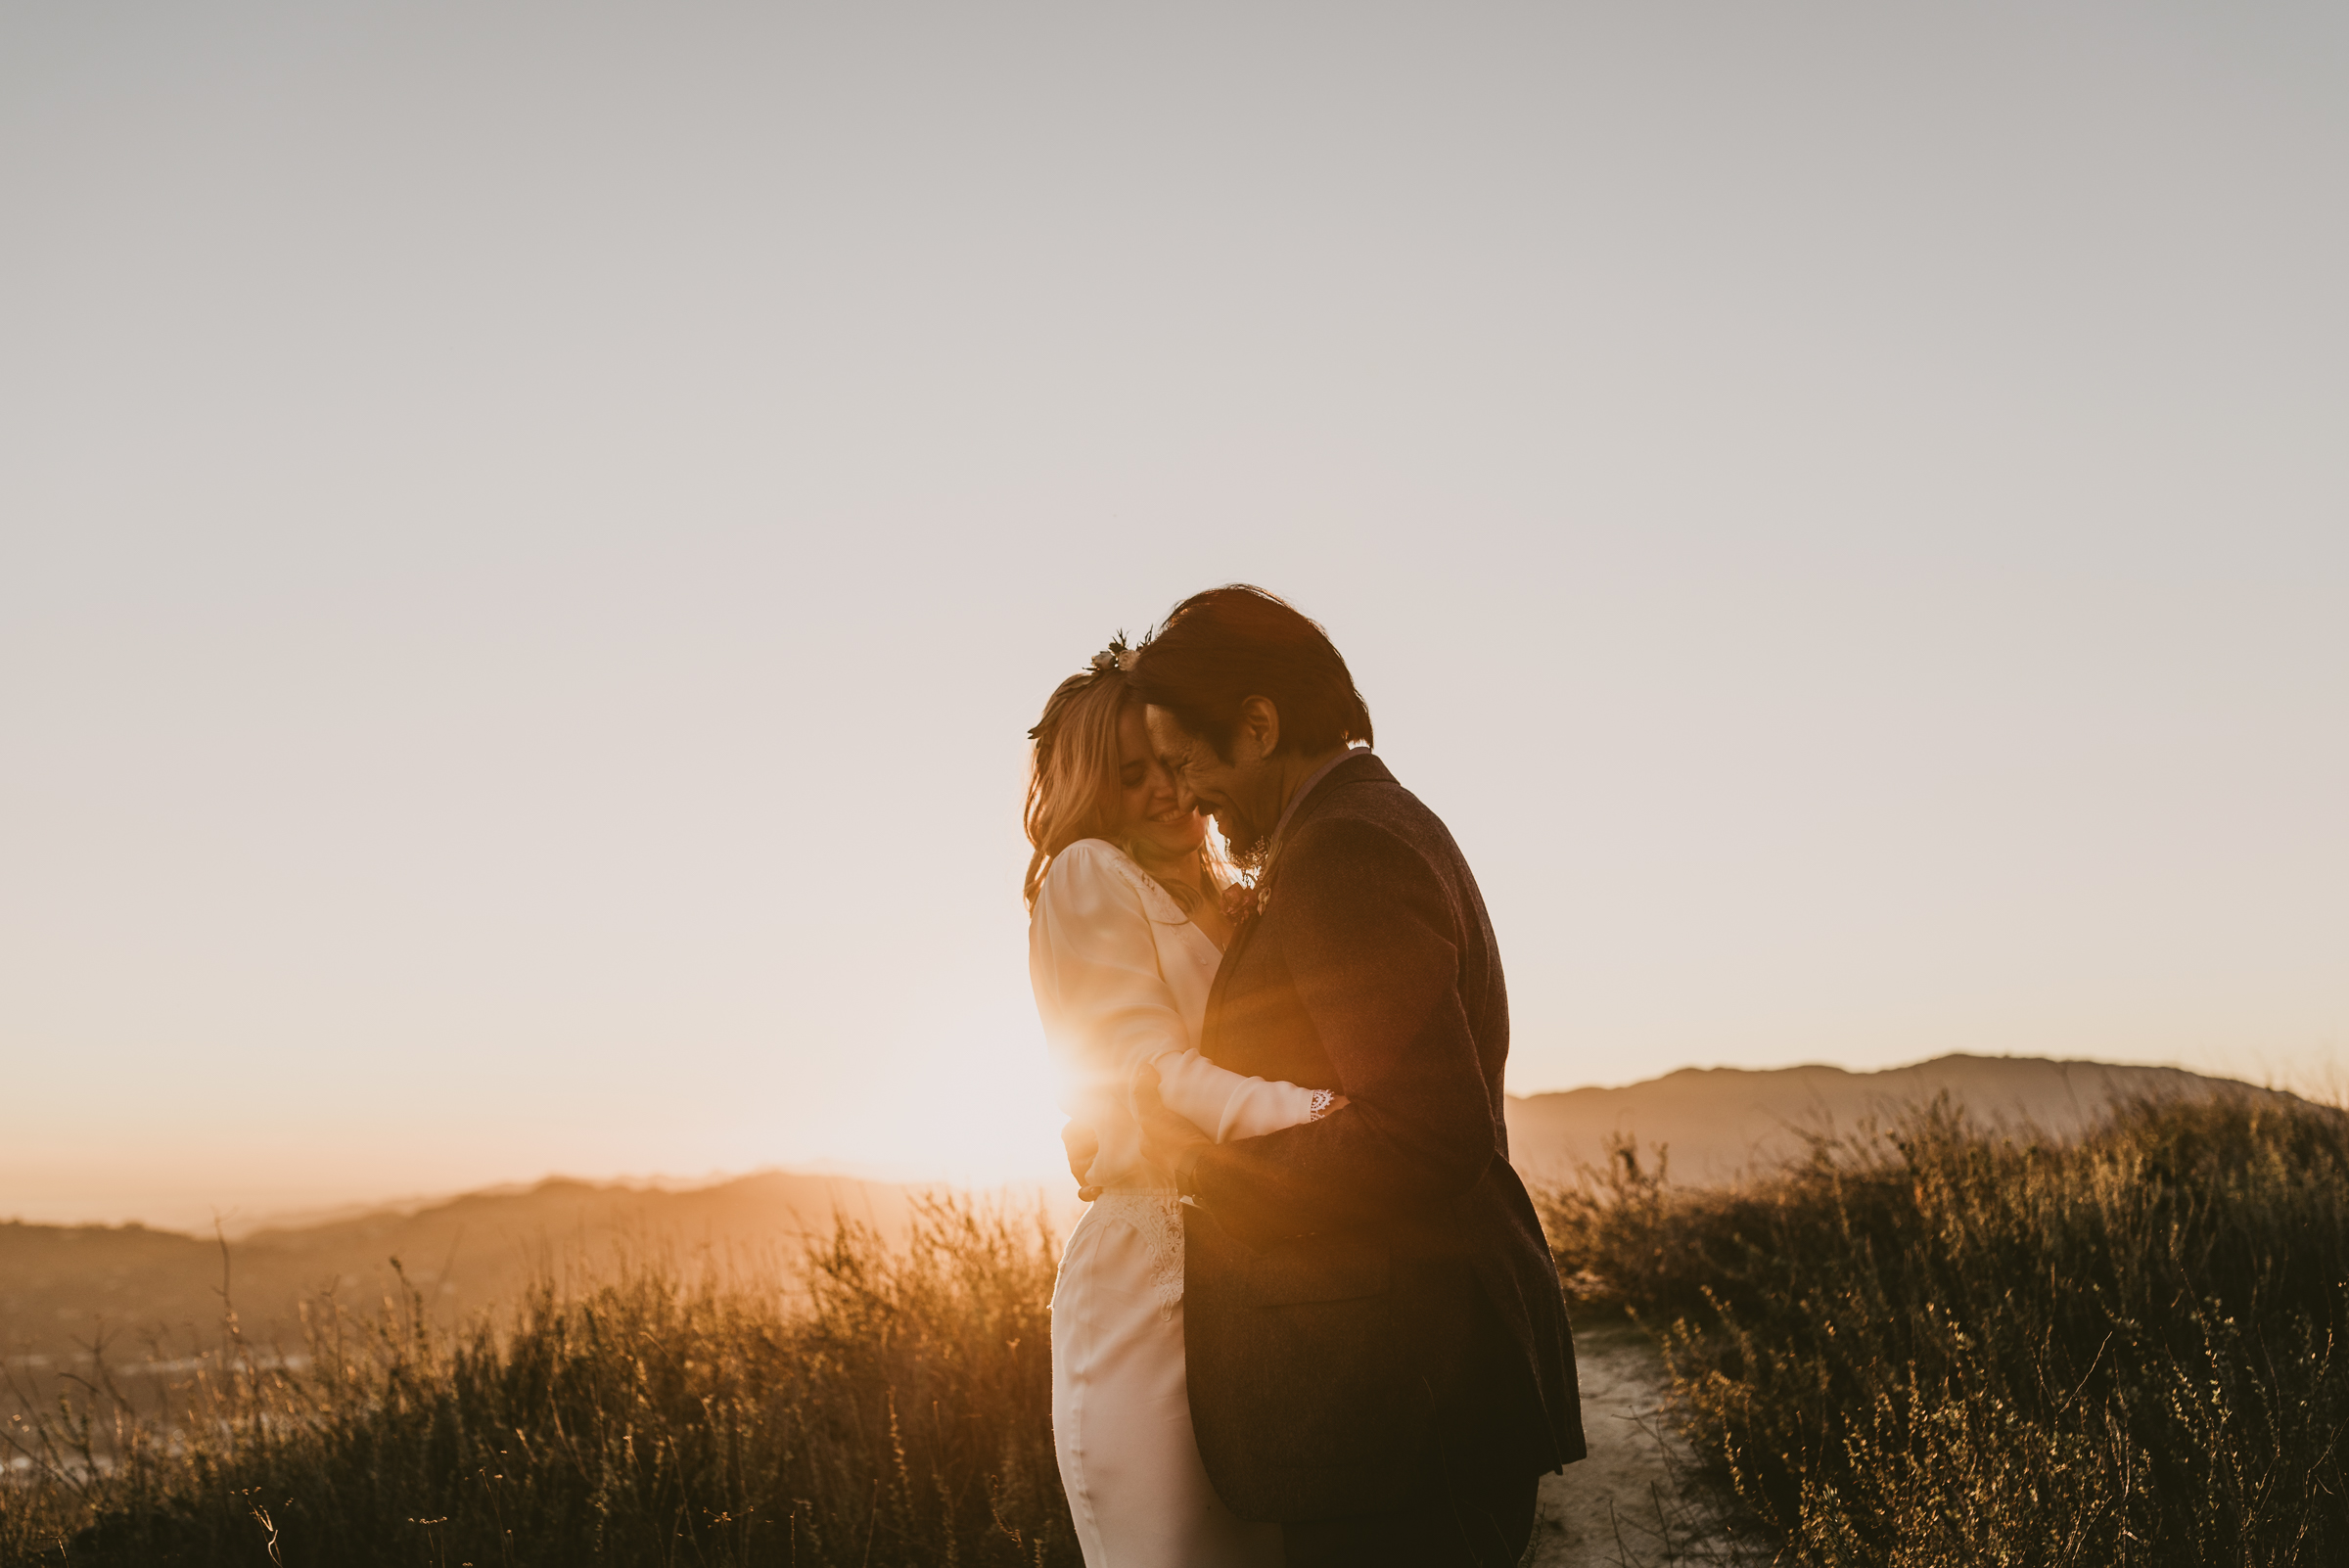 ©Isaiah + Taylor Photography - Intimate Elopement, Eaton Canyon, Los Angeles Wedding Photographer-87.jpg